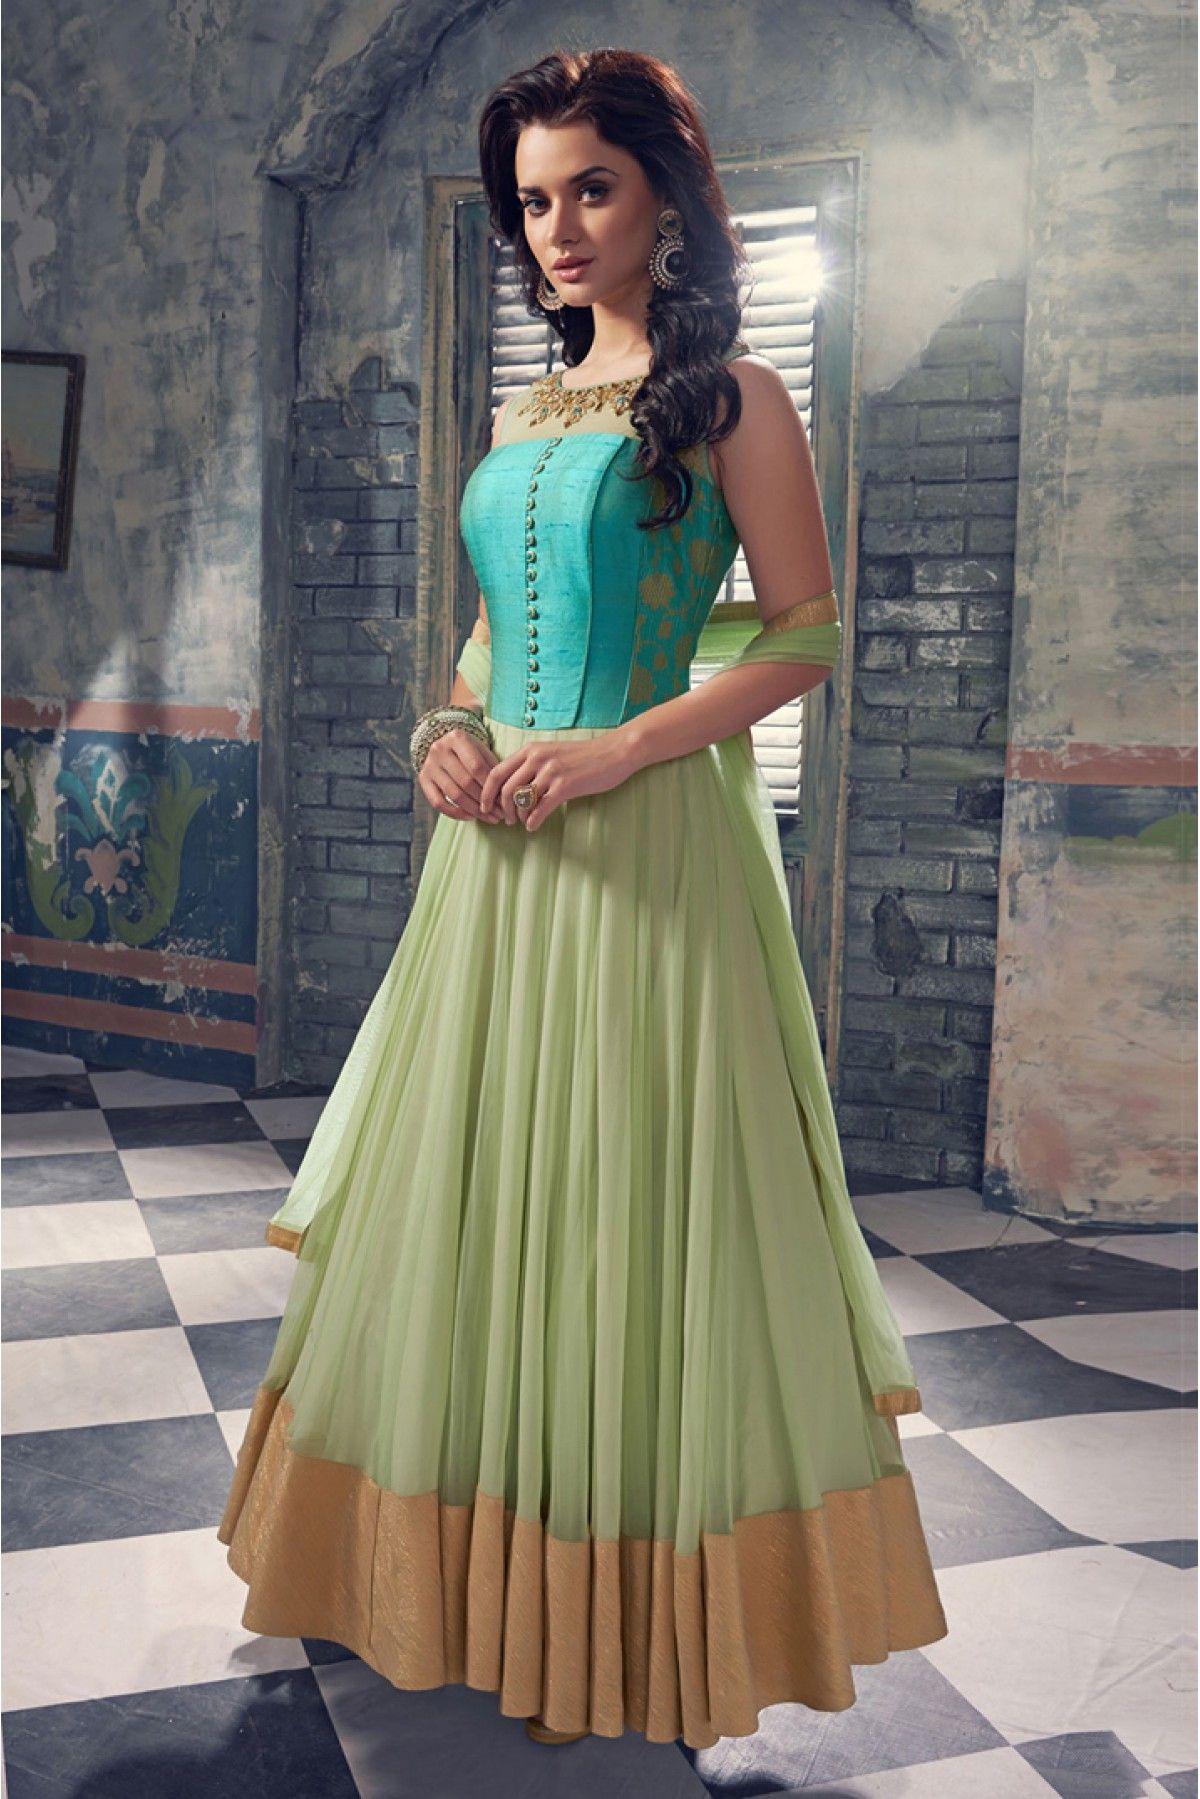 aad1bfbe27 Net Anarkali Suit in Sea Green Colour Churidar, Indian Salwar Kameez,  Salwar Kameez Online